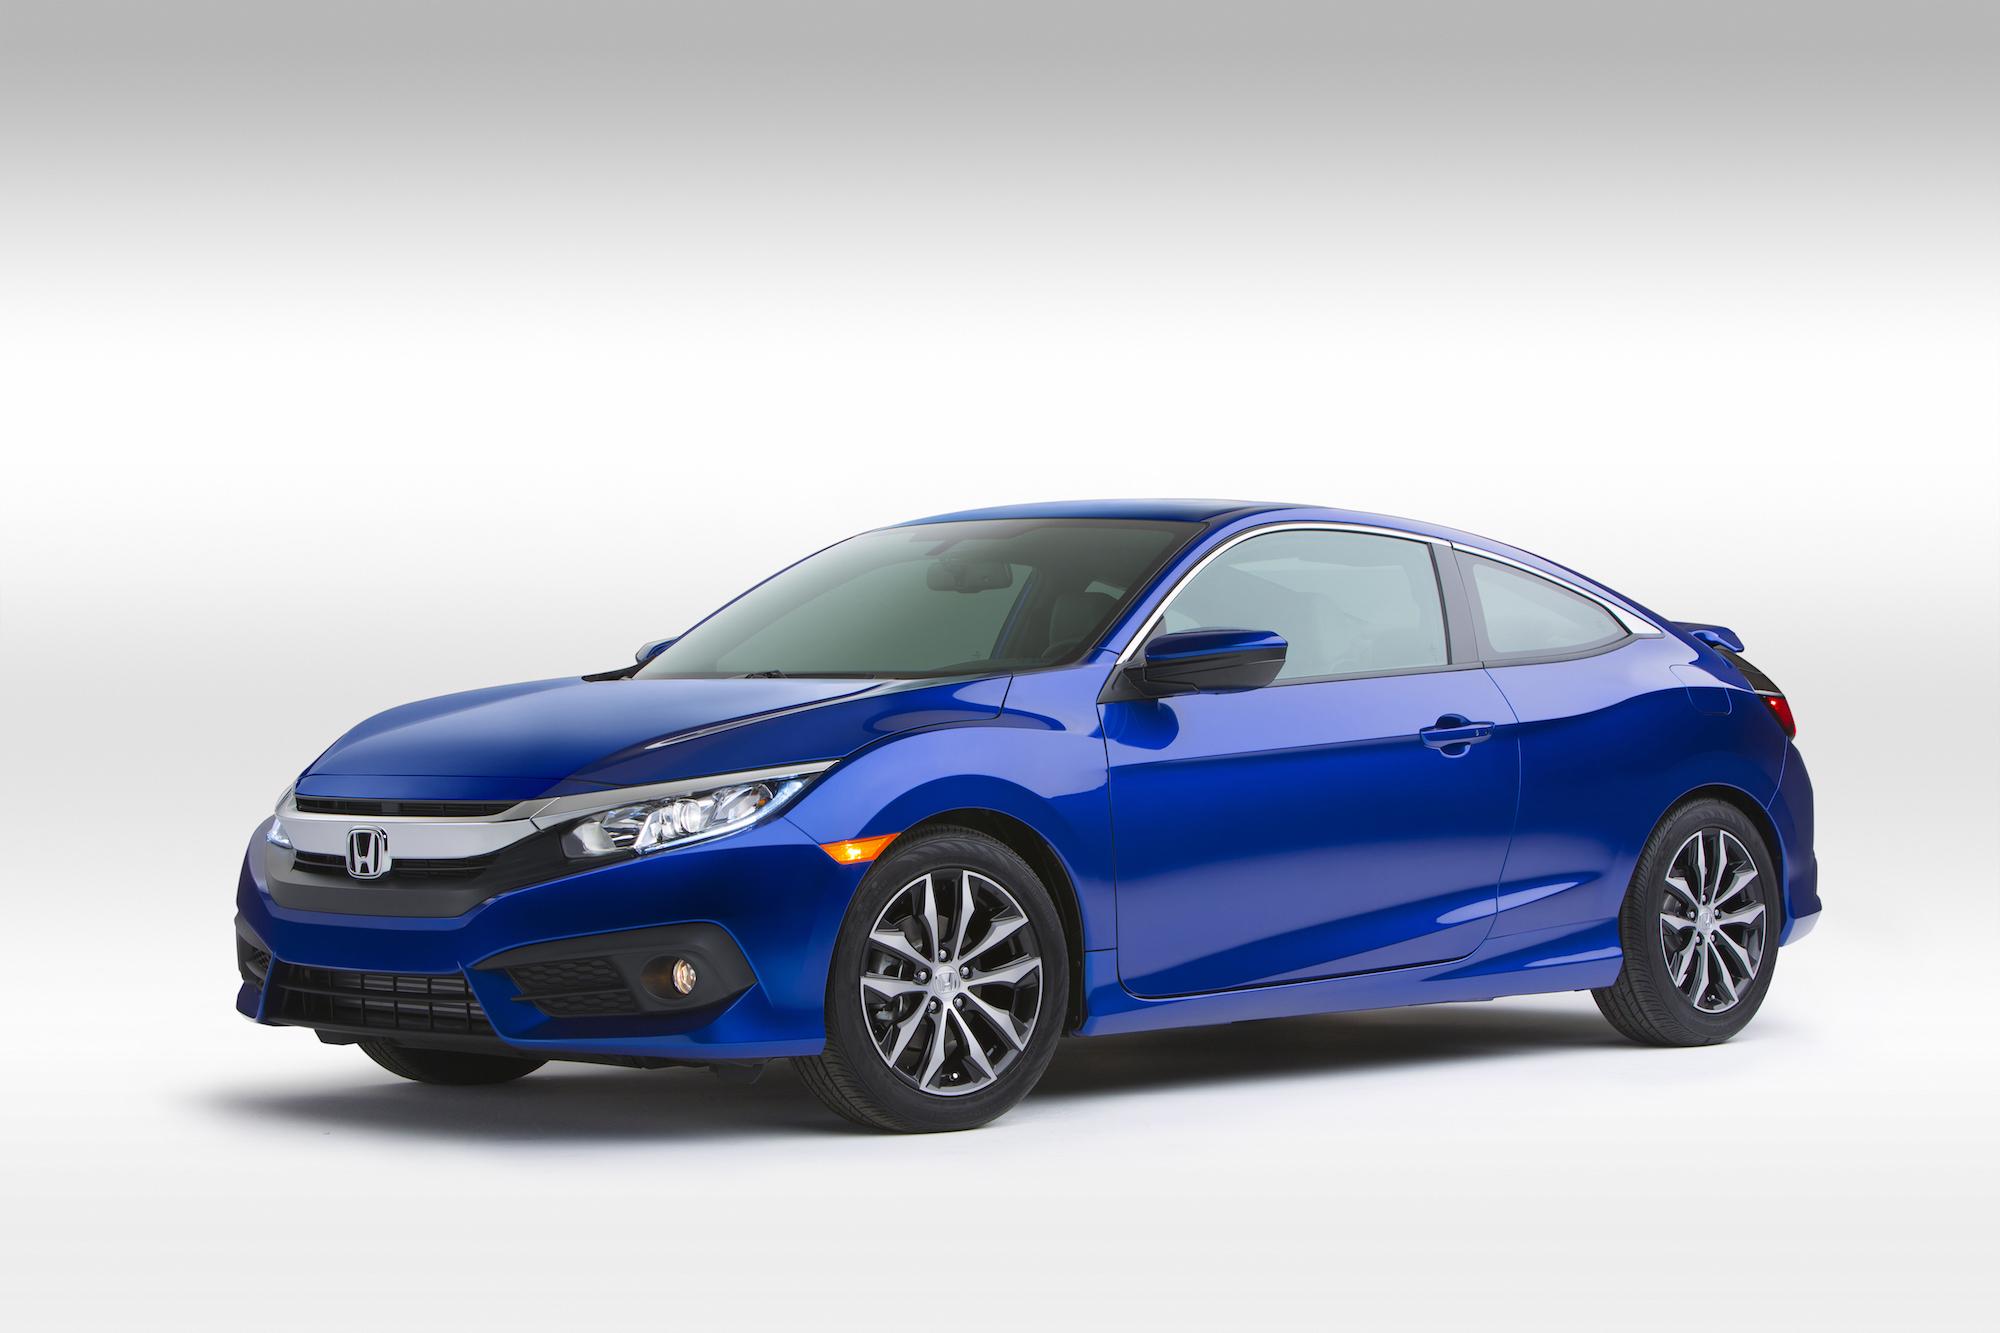 Honda Civic Miles Per Gallon >> 2016 Honda Civic Coupe Gas Mileage Equals Sedan S 35 Mpg